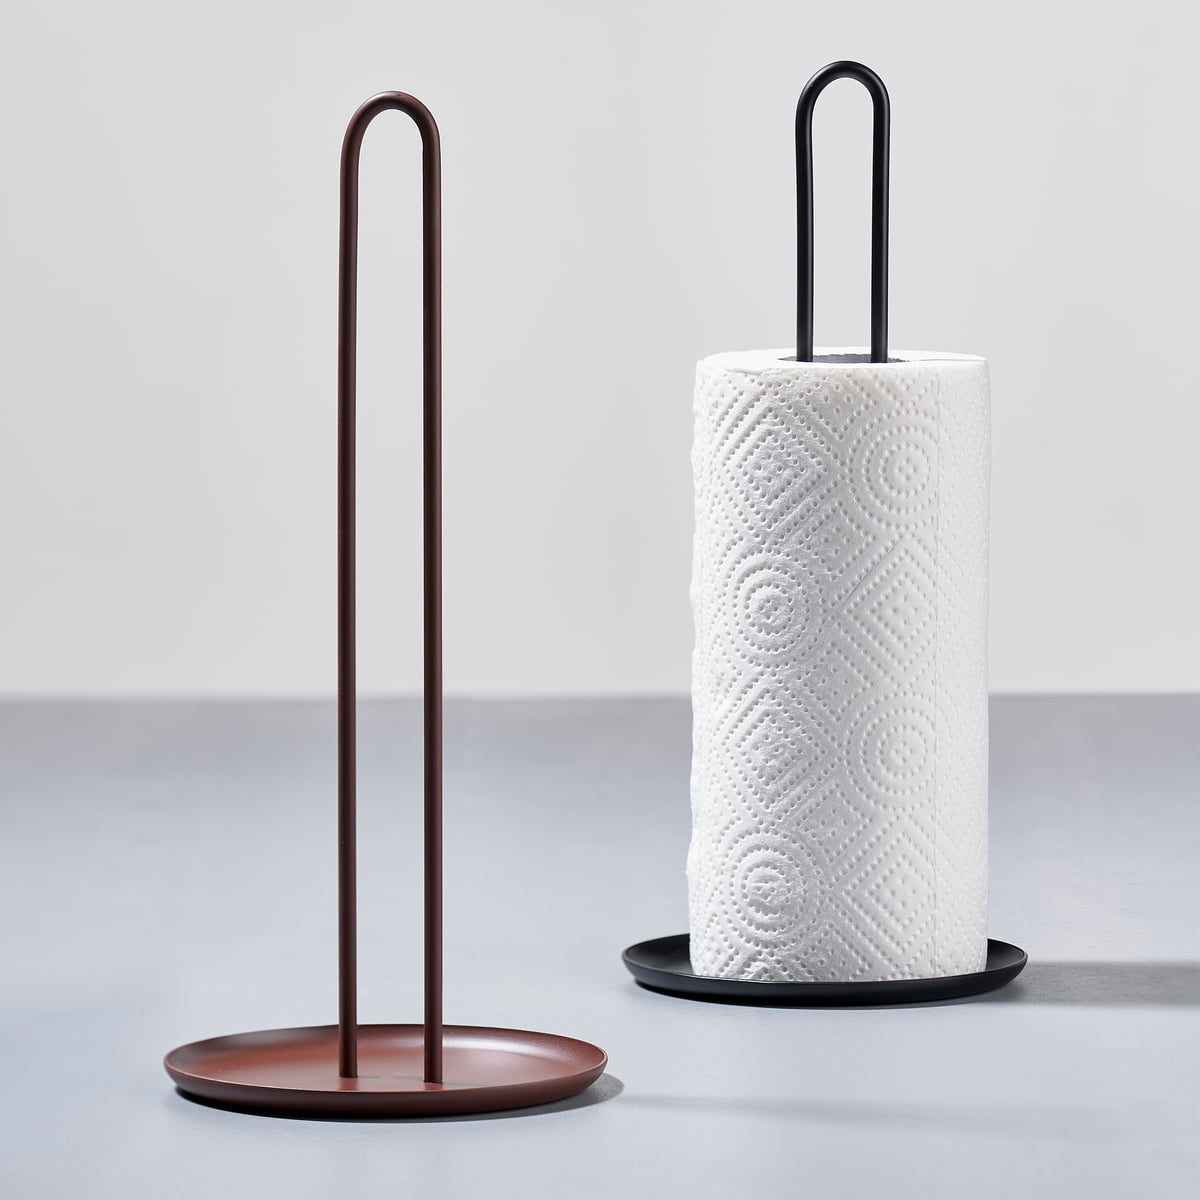 Zone denmark - Singles kitchen roll holder, ø 14,5 x h 32 cm, black